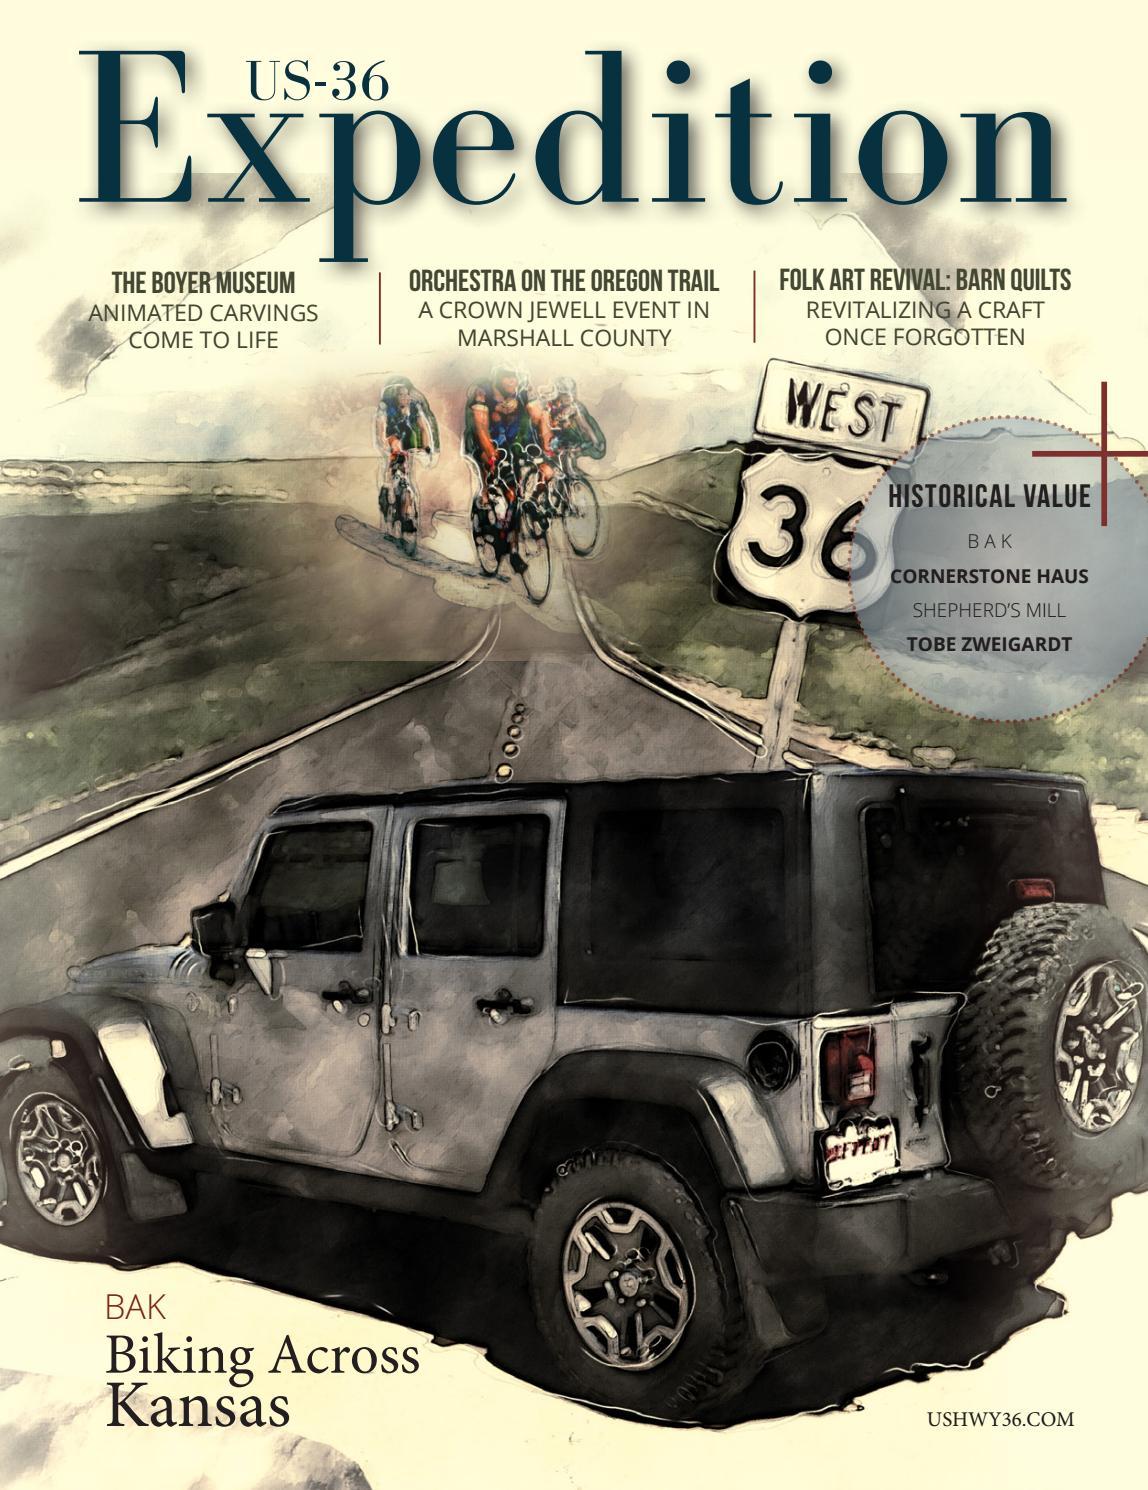 Kansas republic county agenda - Us Hwy 36 Guide Book